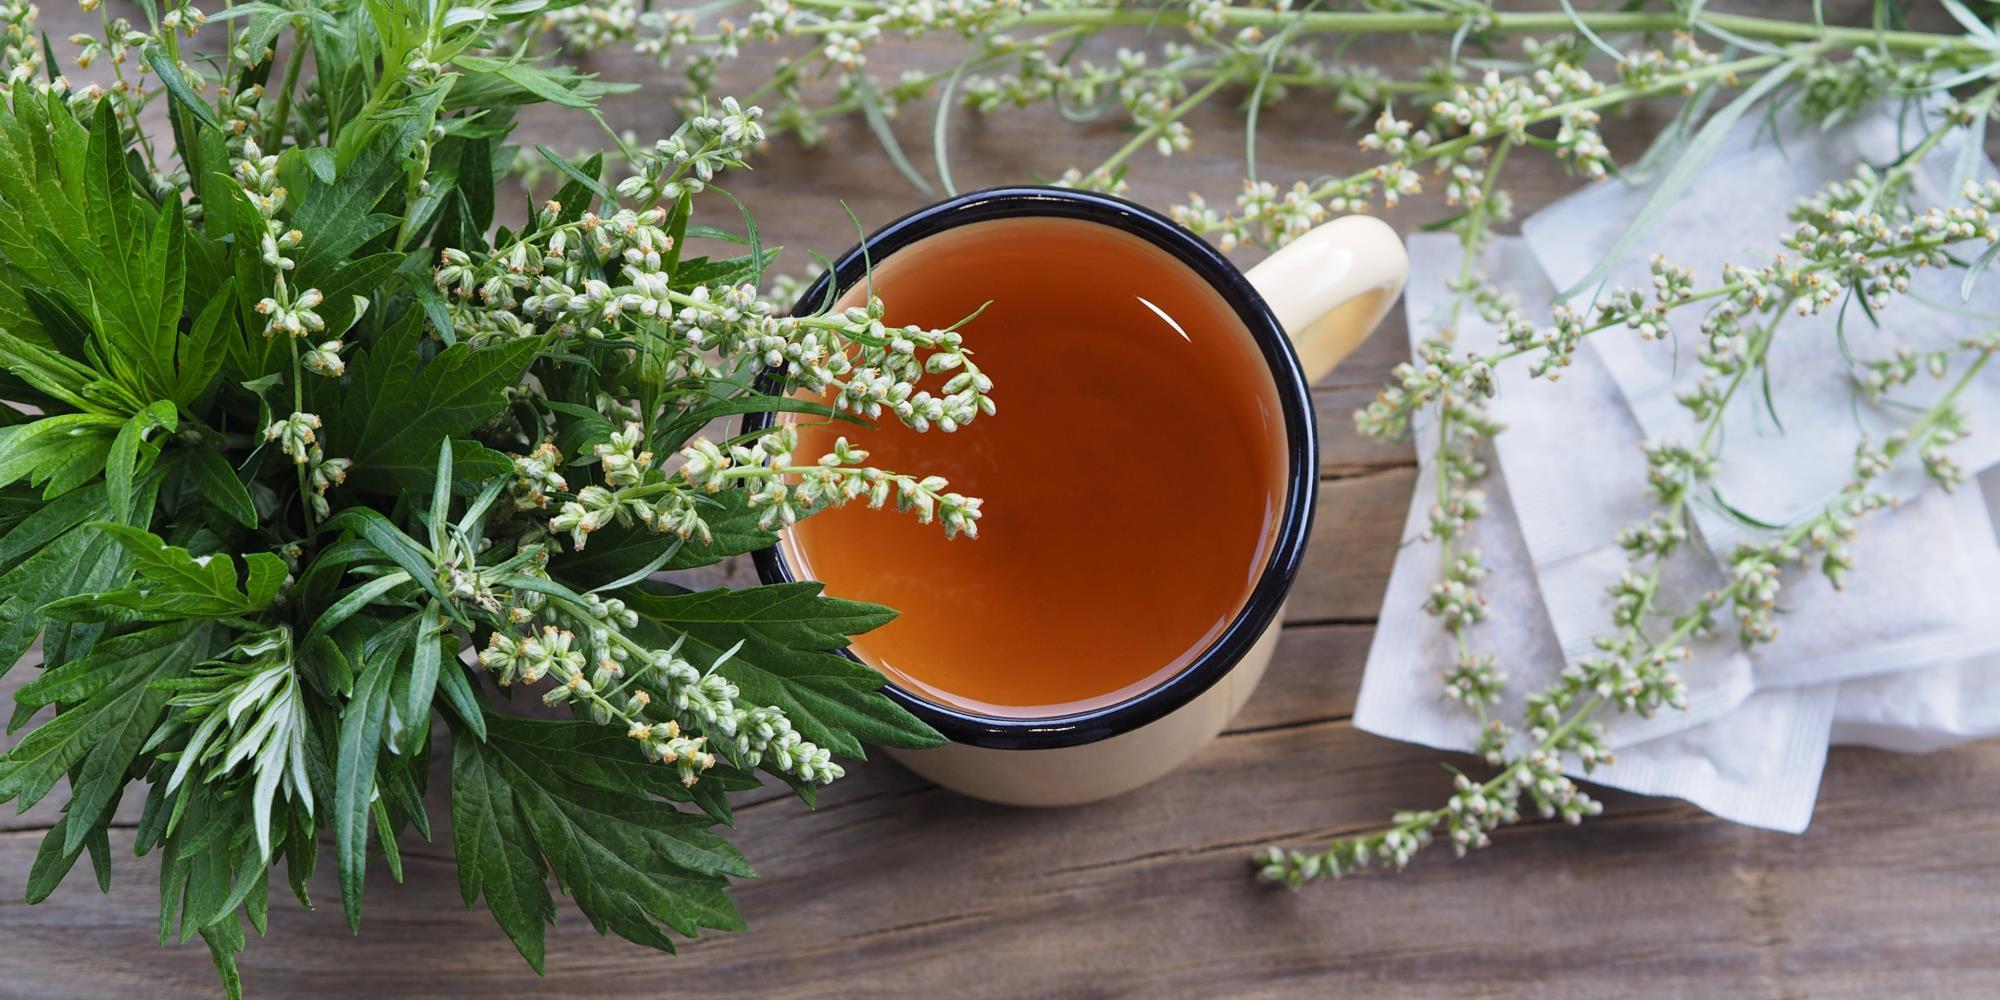 Can you drink Mugwort tea?